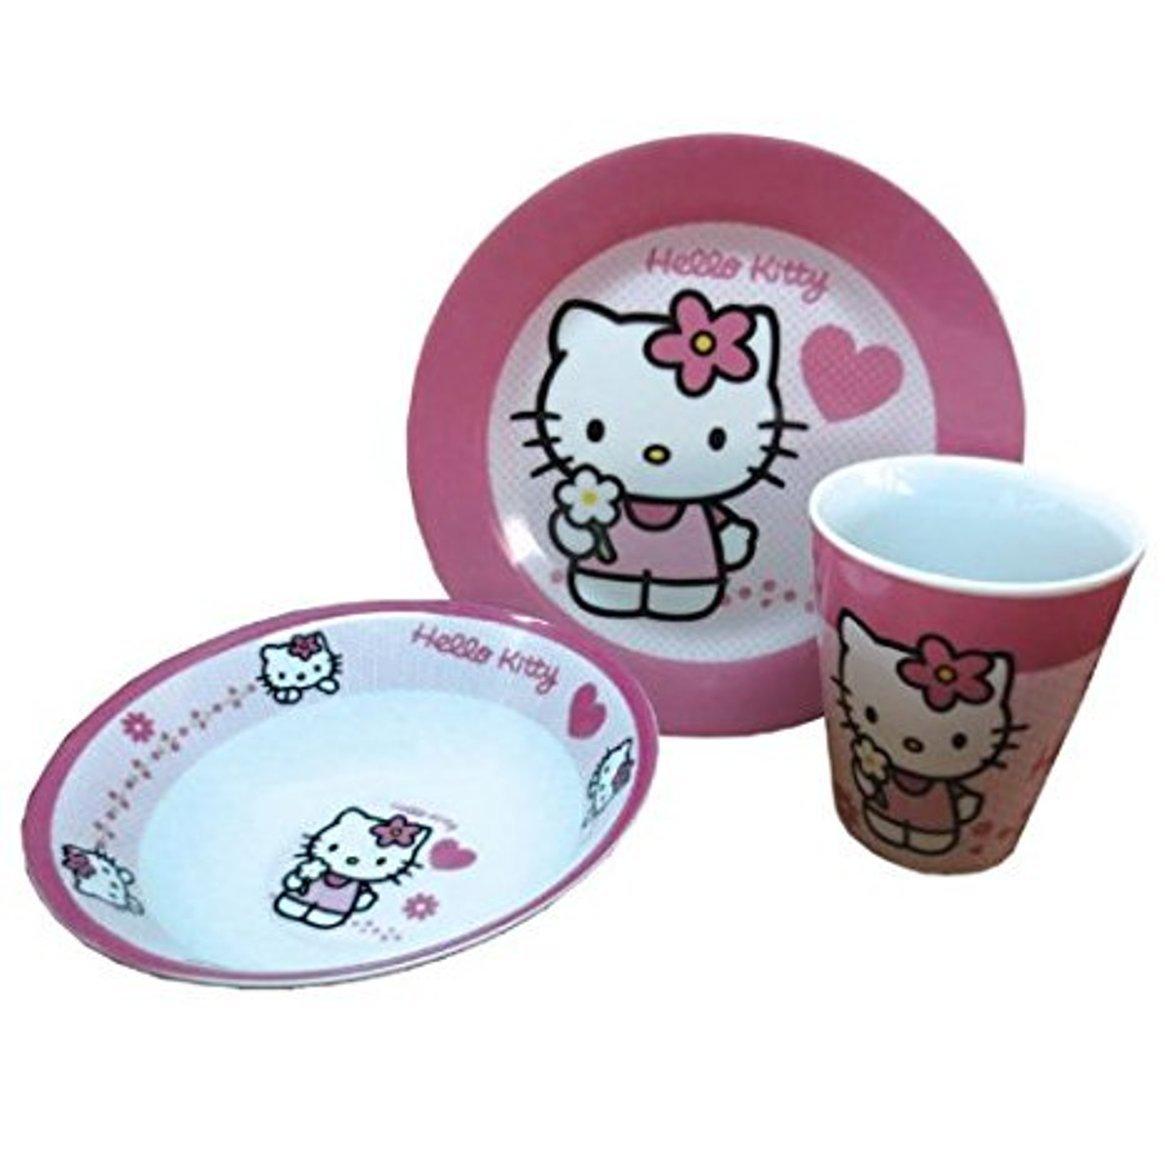 Hello Kitty - Frühstücksset, 3-teilig